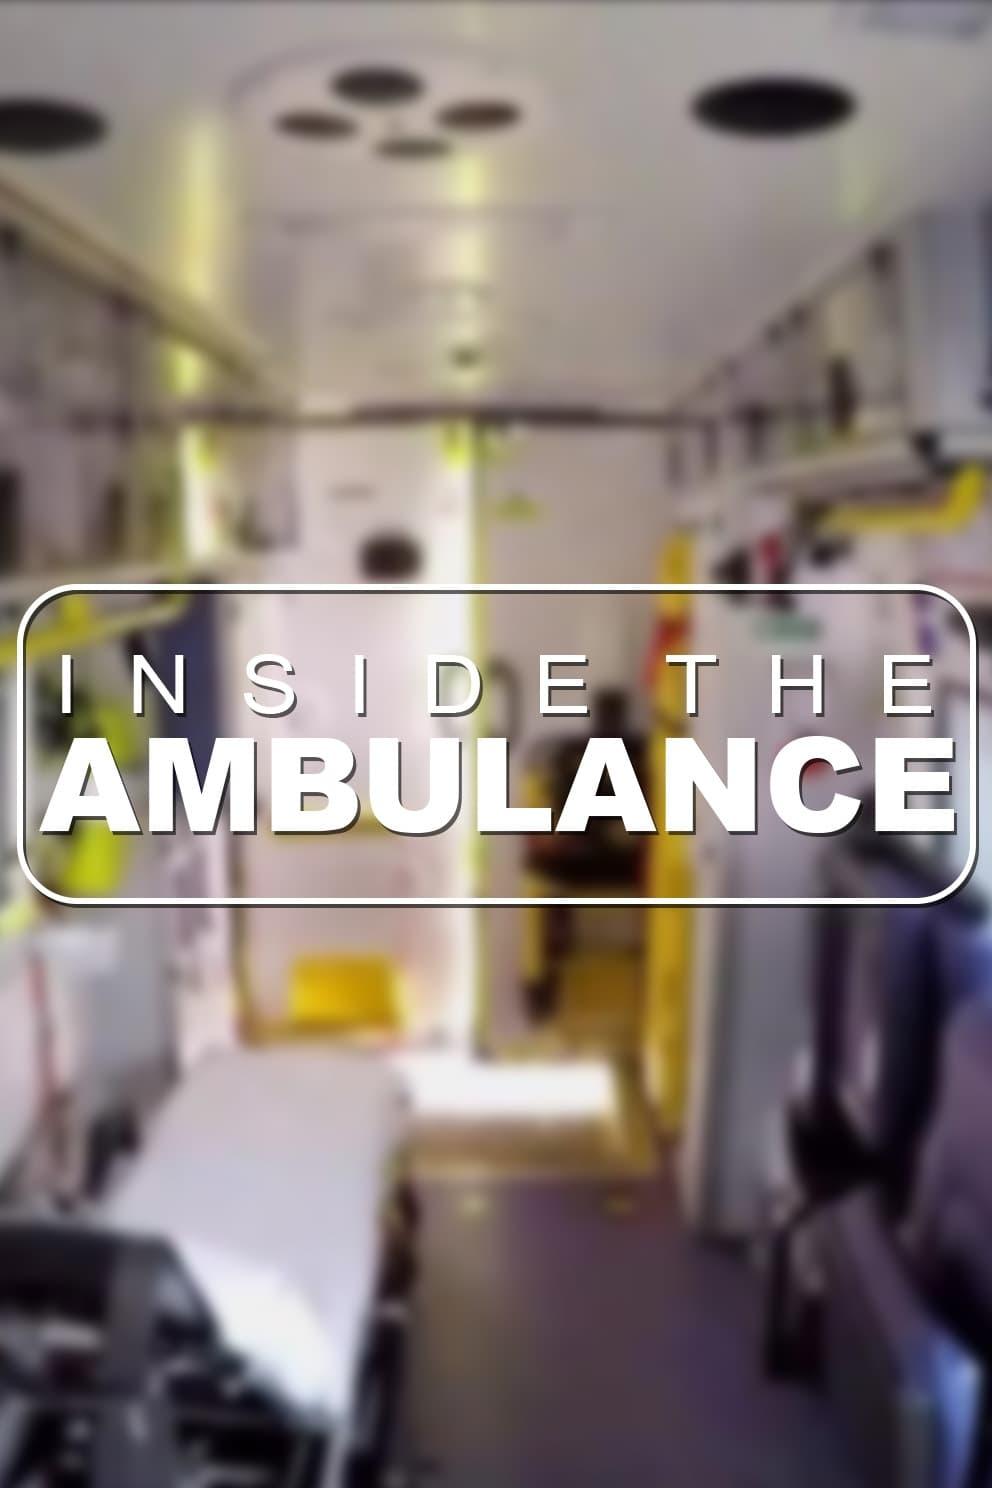 Inside the Ambulance